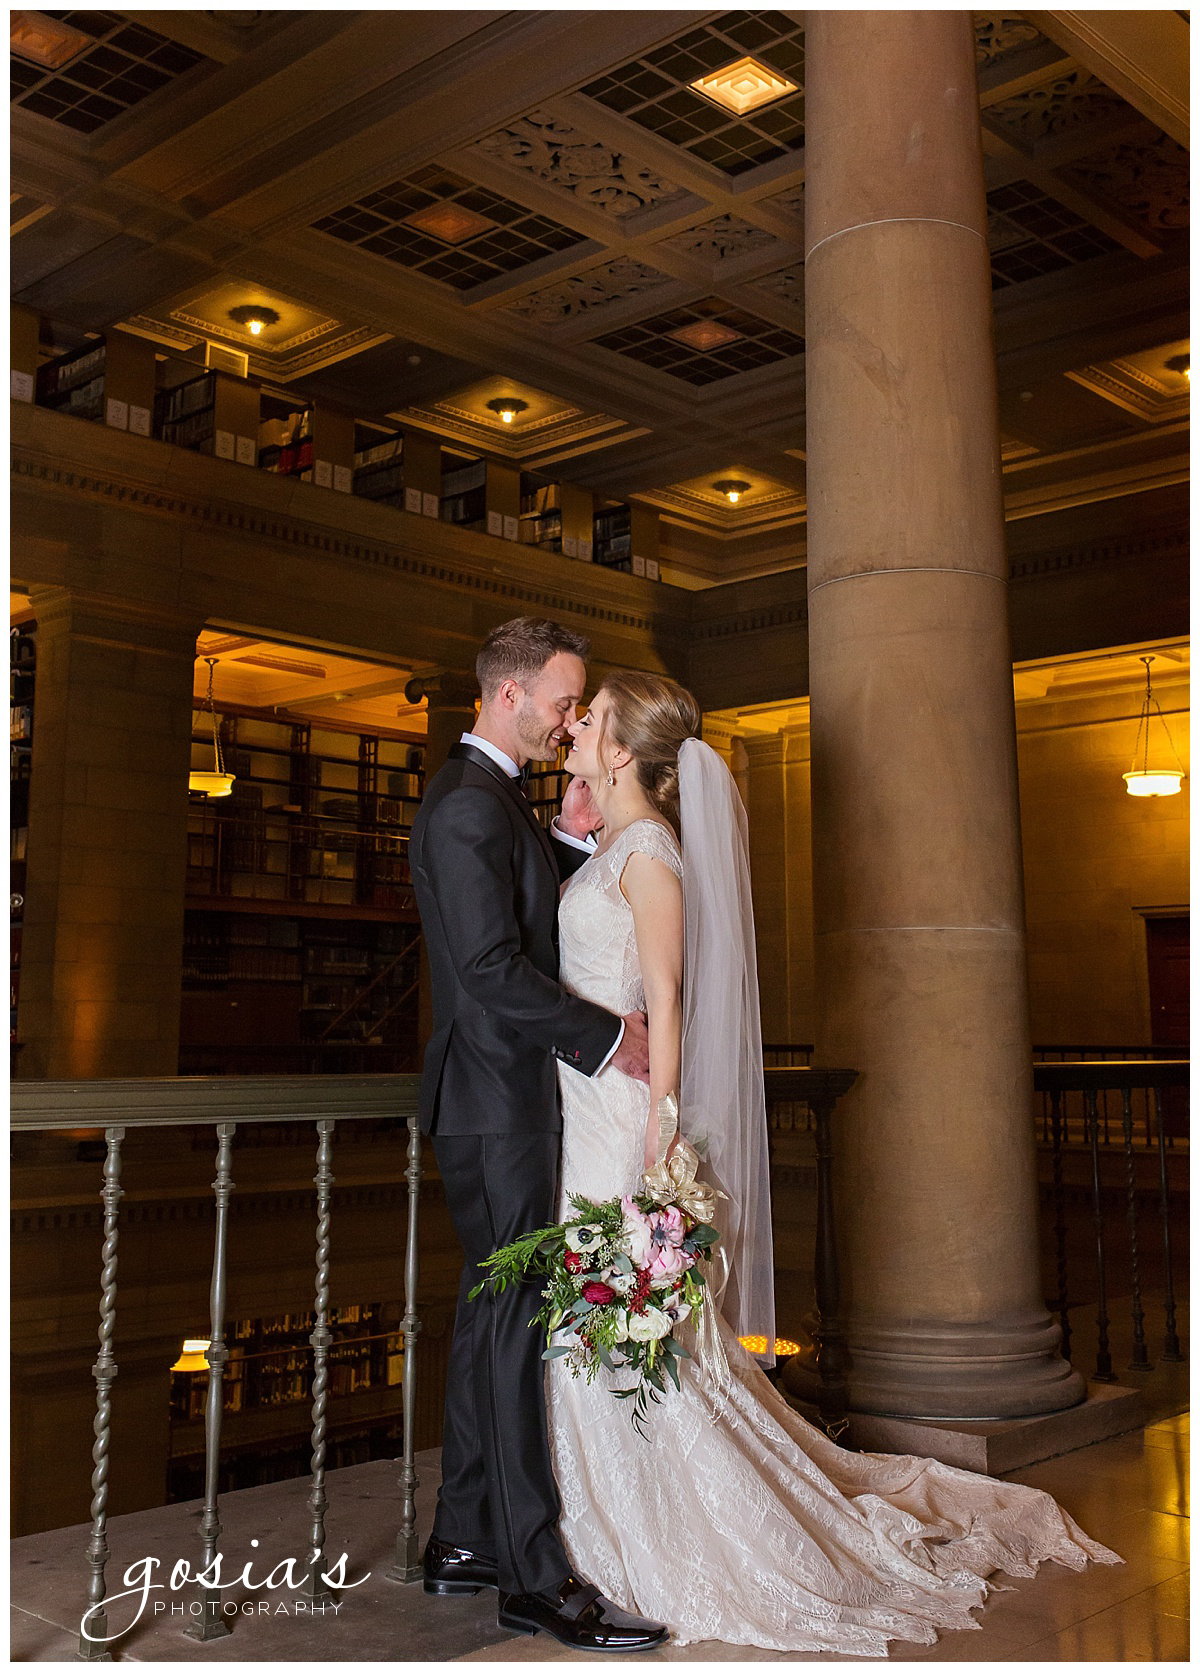 Gosias-Photography-Appleton-wedding-photographer-Saint-Paul-James-J-Hill-Center-ceremony-reception-Minnesota-_0047.jpg